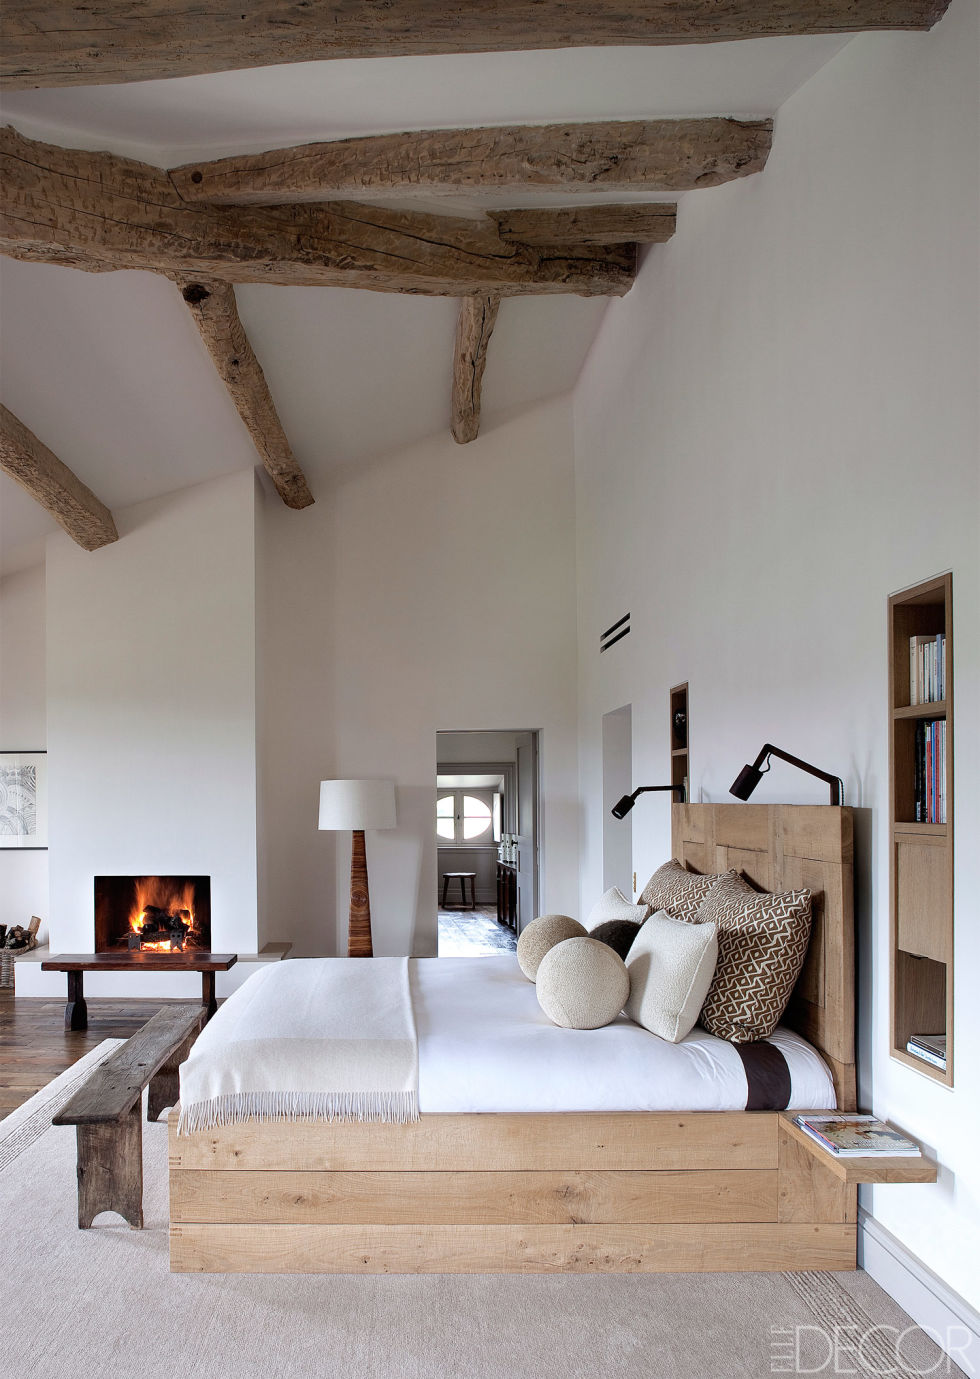 Living Room Room Decor Inspiration room decor inspiration elle decors most popular rooms